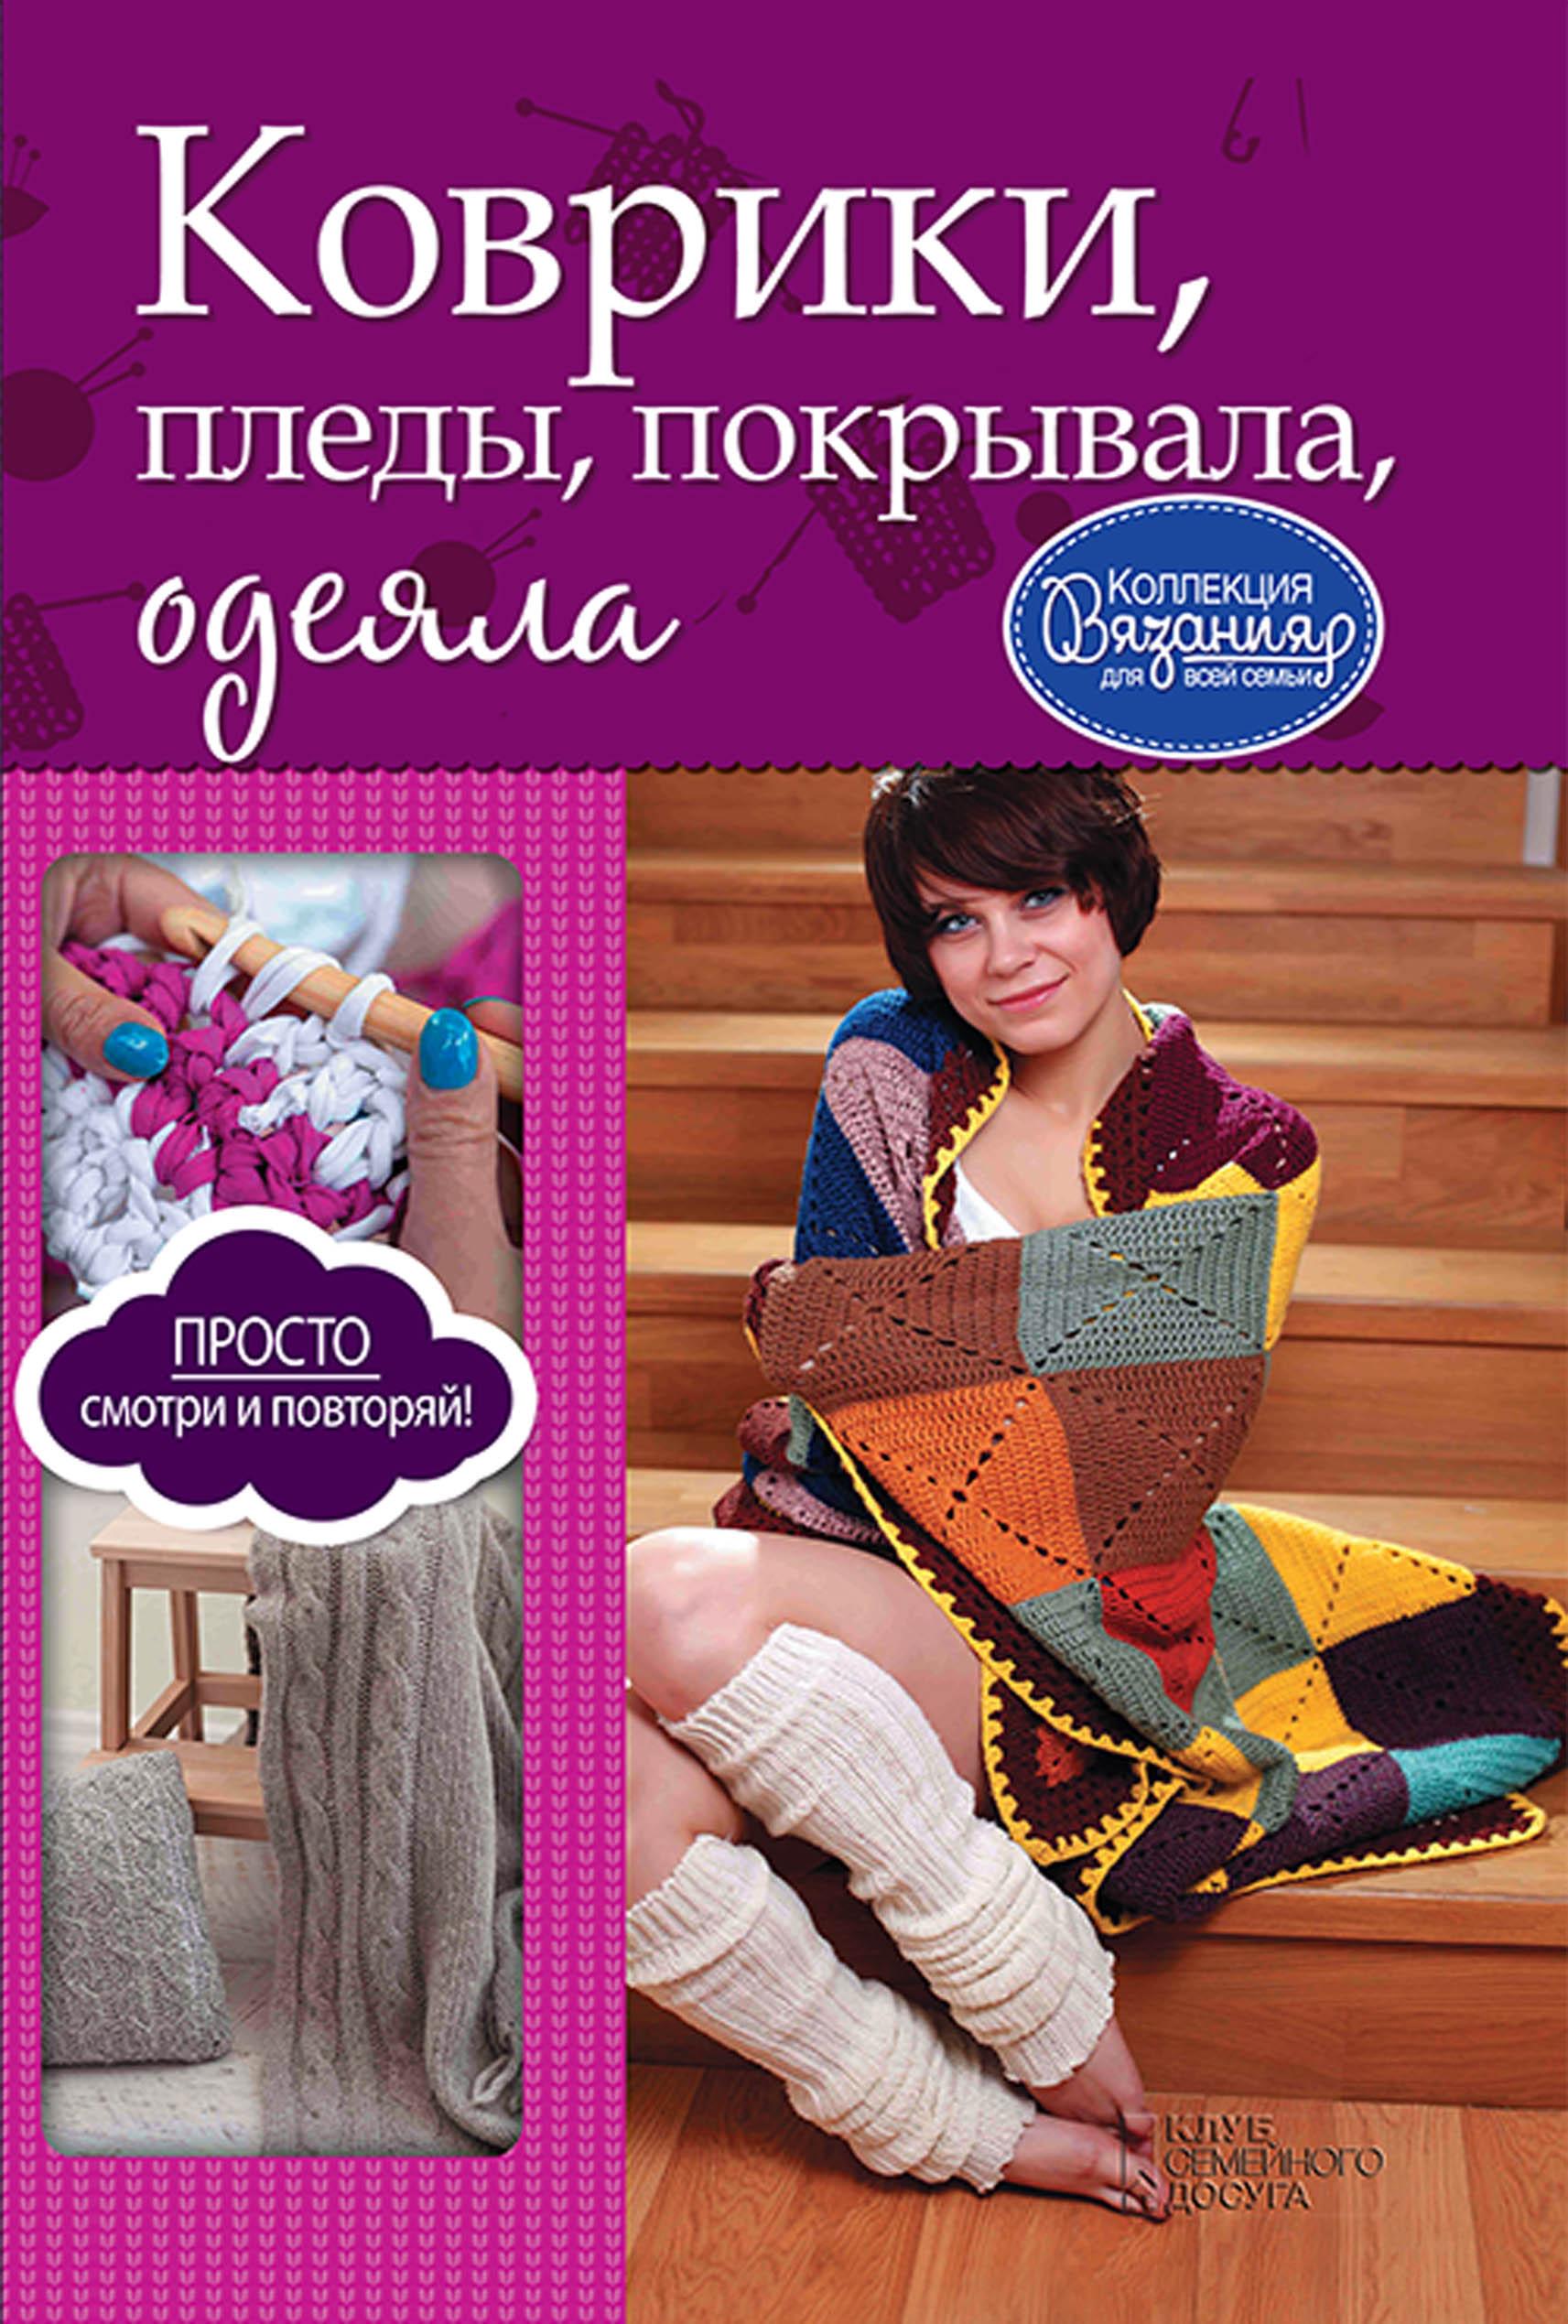 Фото - Ирина Зайцева Коврики, пледы, покрывала, одеяла и а зайцева коврики пледы покрывала одеяла